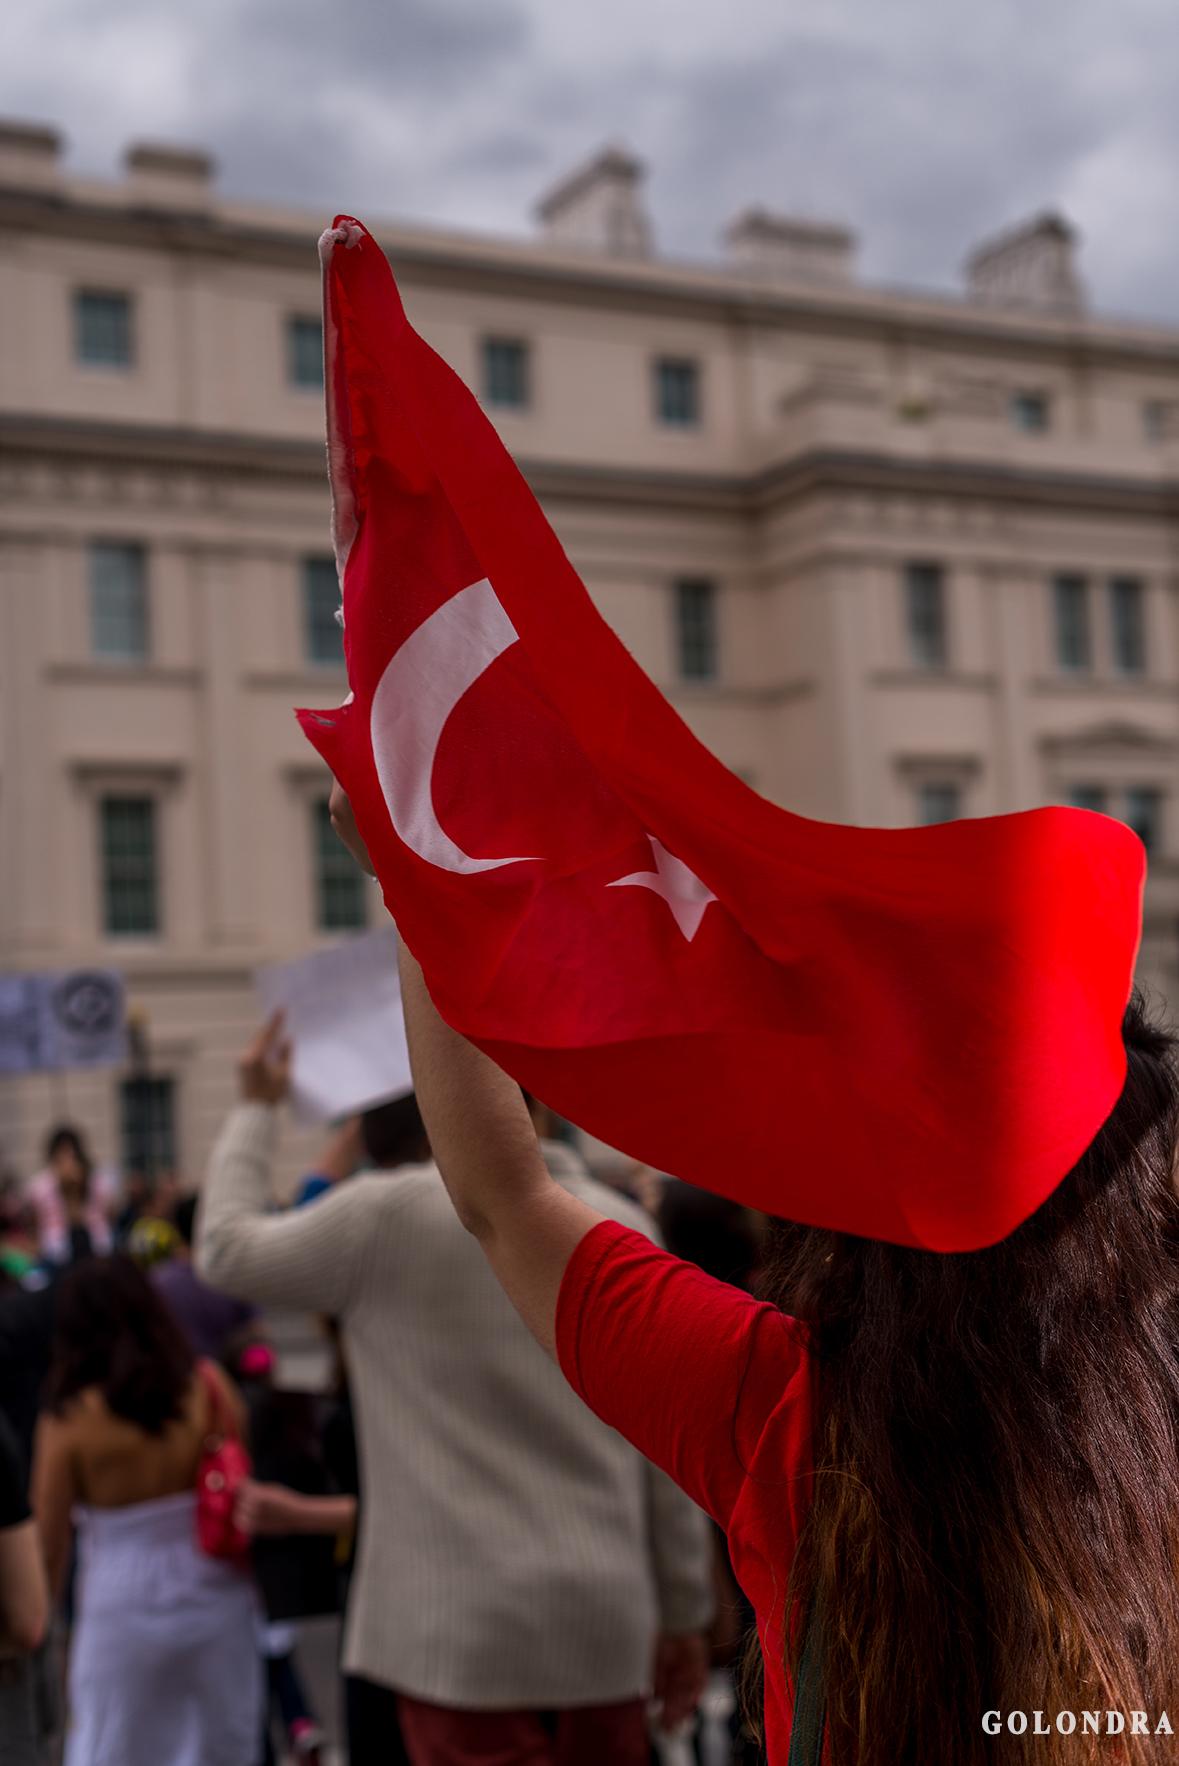 Protesting Turkish Government - Turk Hukumetini Protesto - Londra - London (34)